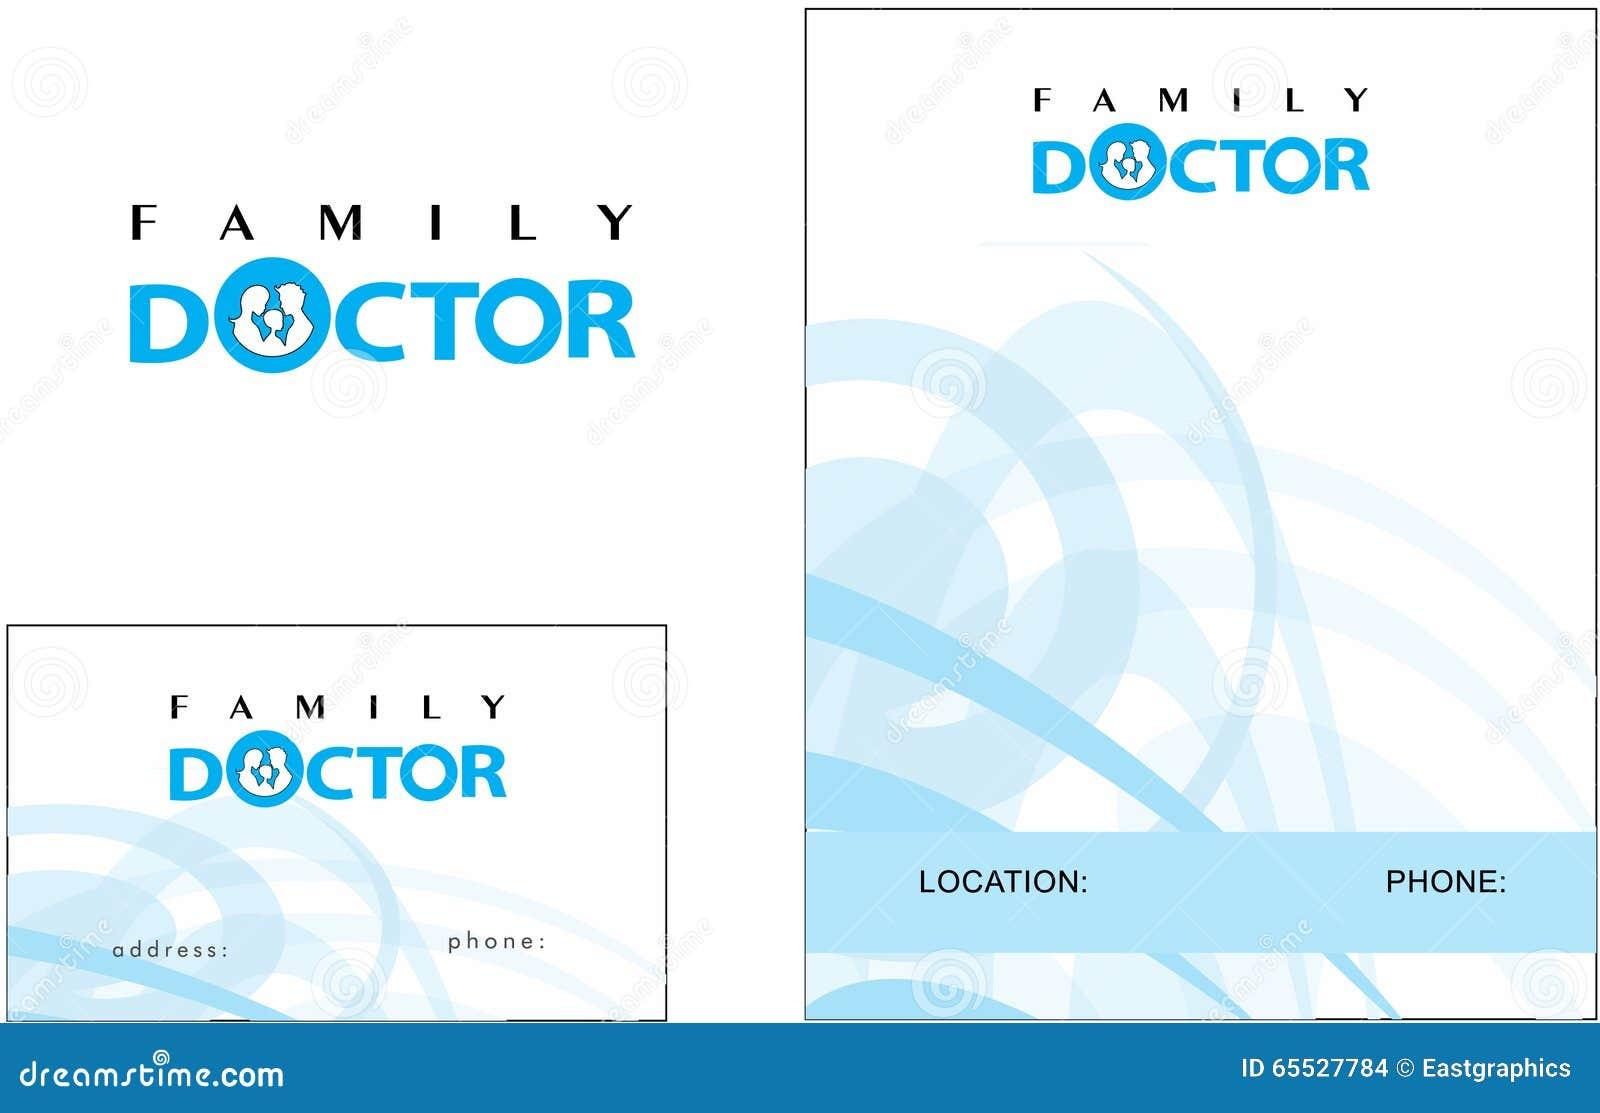 Doctor medicine modern logo business card stock vector image royalty free vector download doctor medicine modern logo business card magicingreecefo Images